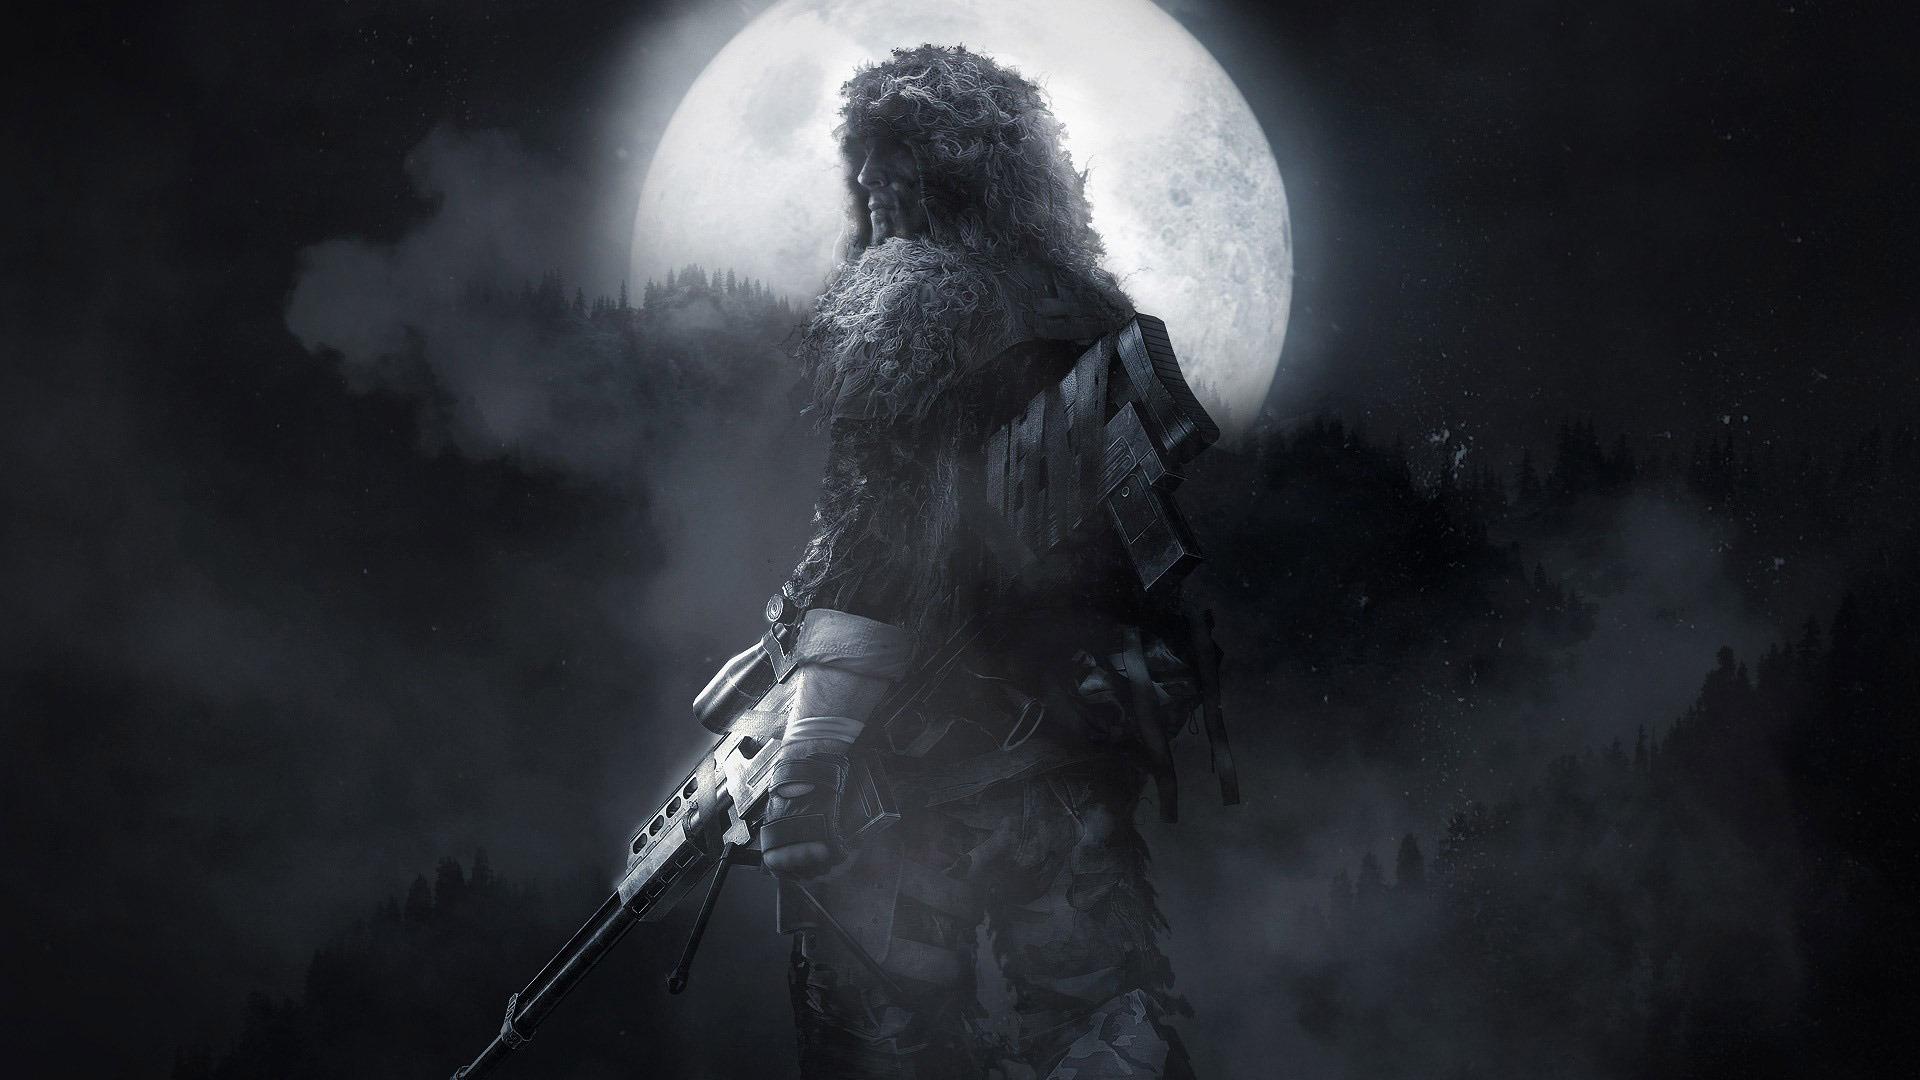 Sniper   Ghost Warrior 2 wallpaper 7755 1920x1080